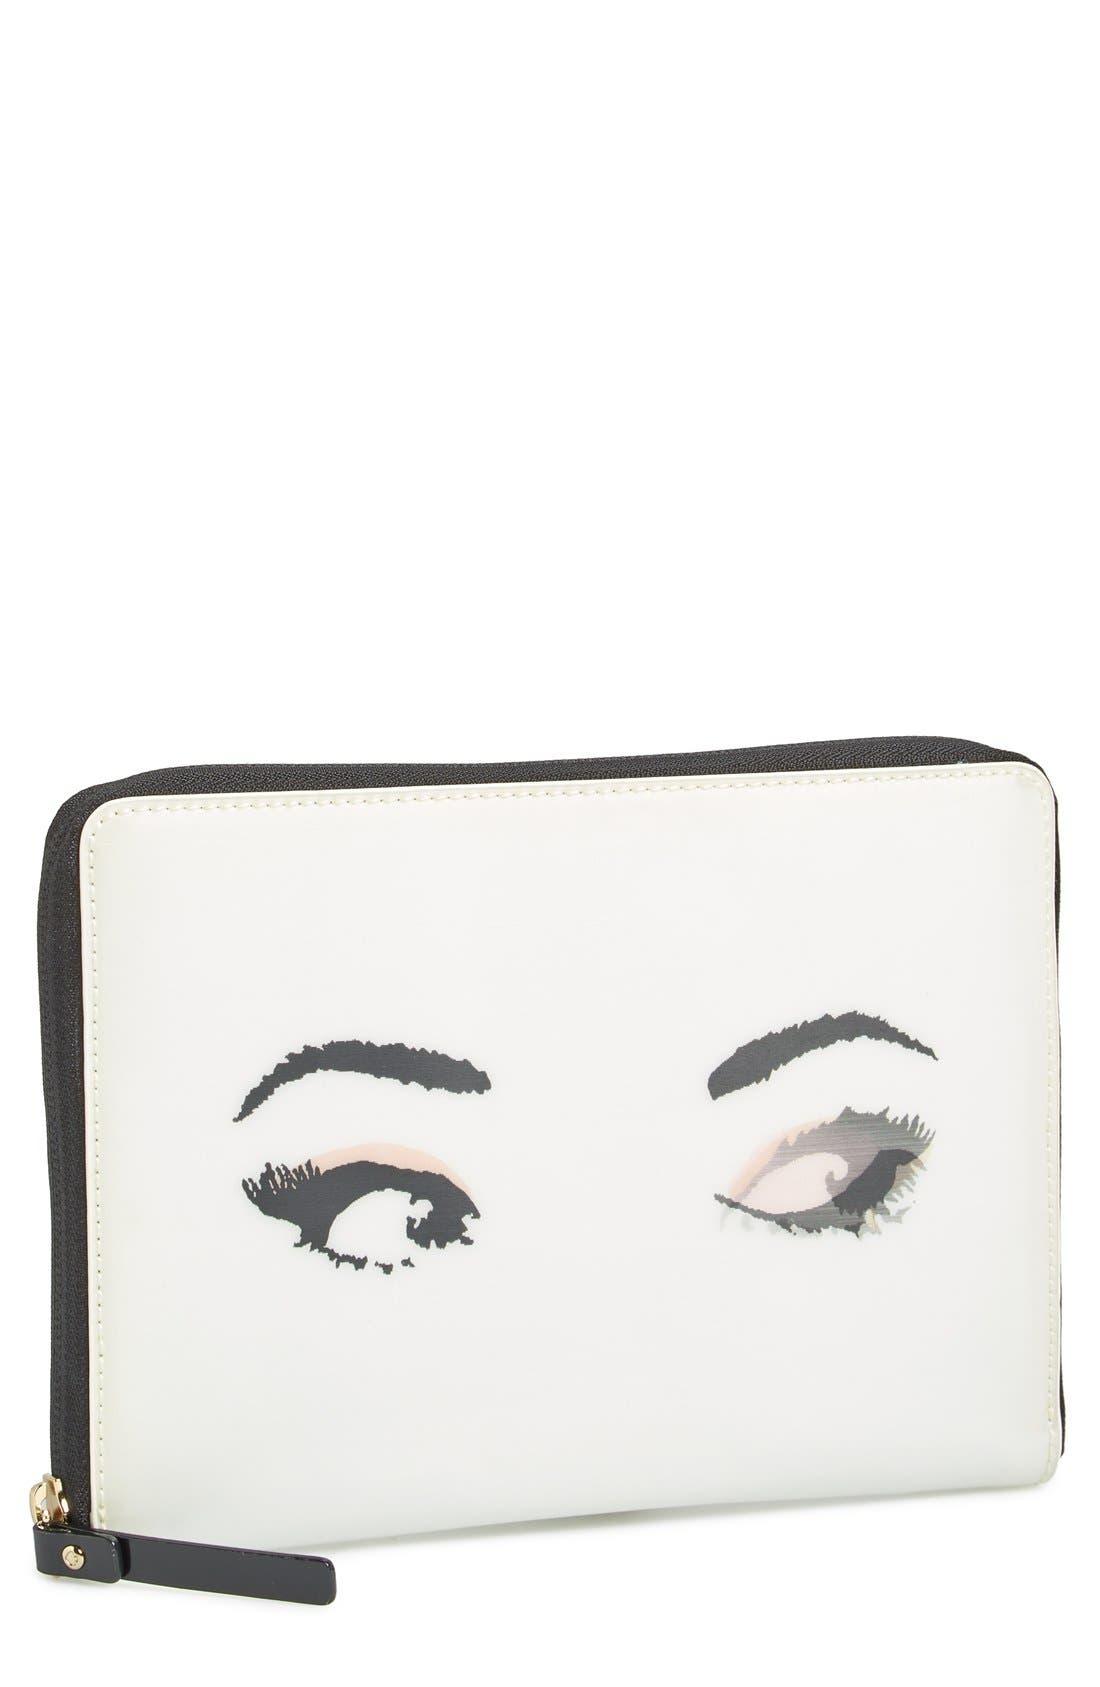 Alternate Image 1 Selected - kate spade new york 'lenticular eyes' iPad mini sleeve